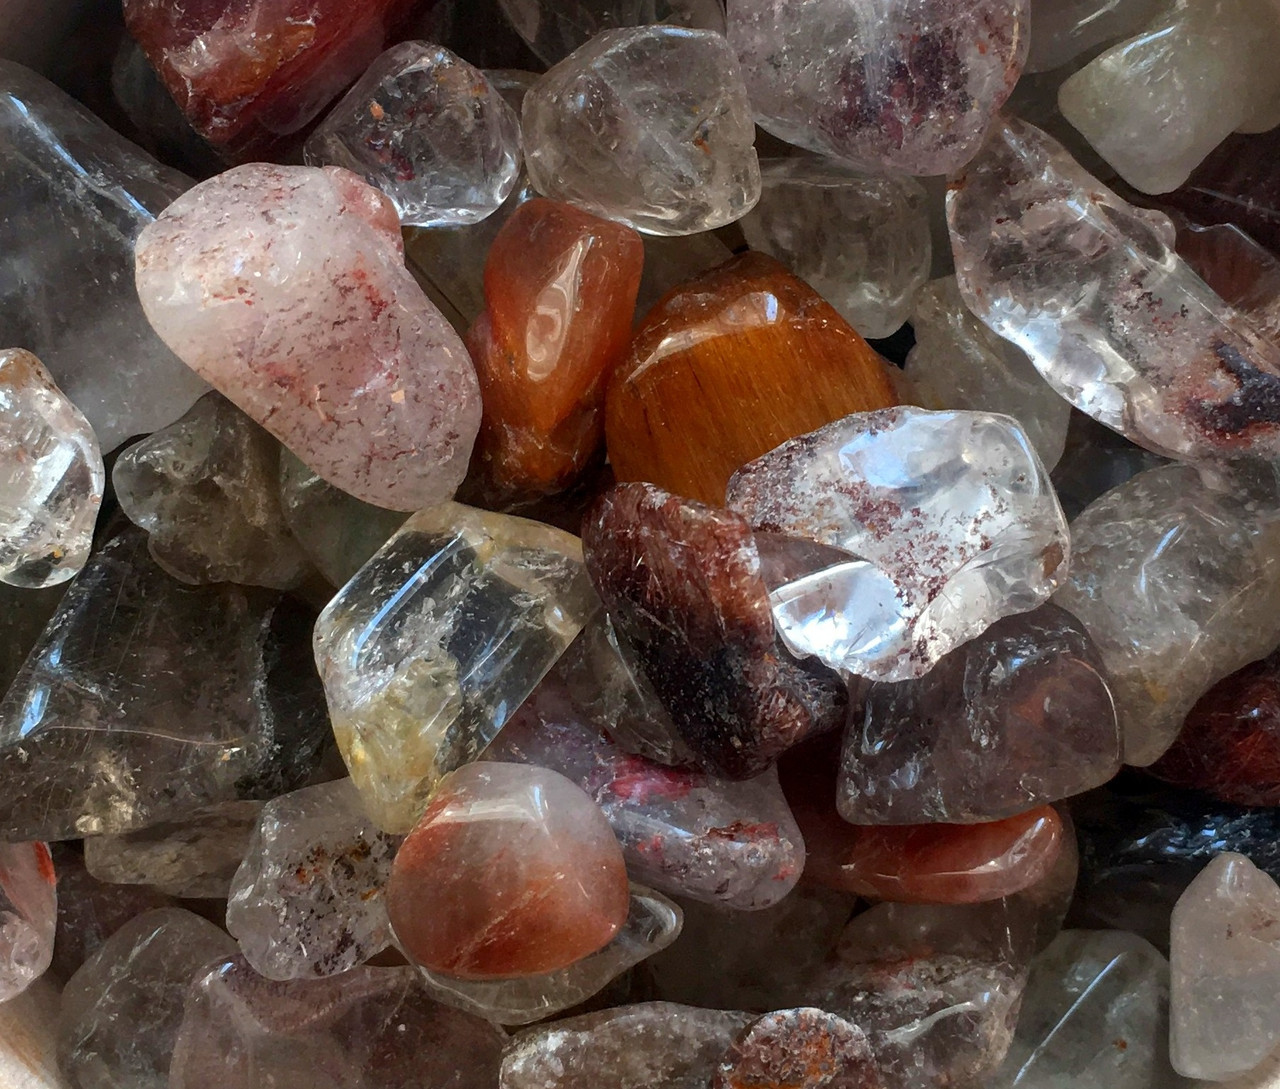 Натуральный камень крошка Хрусталь Рутиловый волосатик 10-25 мм 10 грамм Натуральний камінь скол